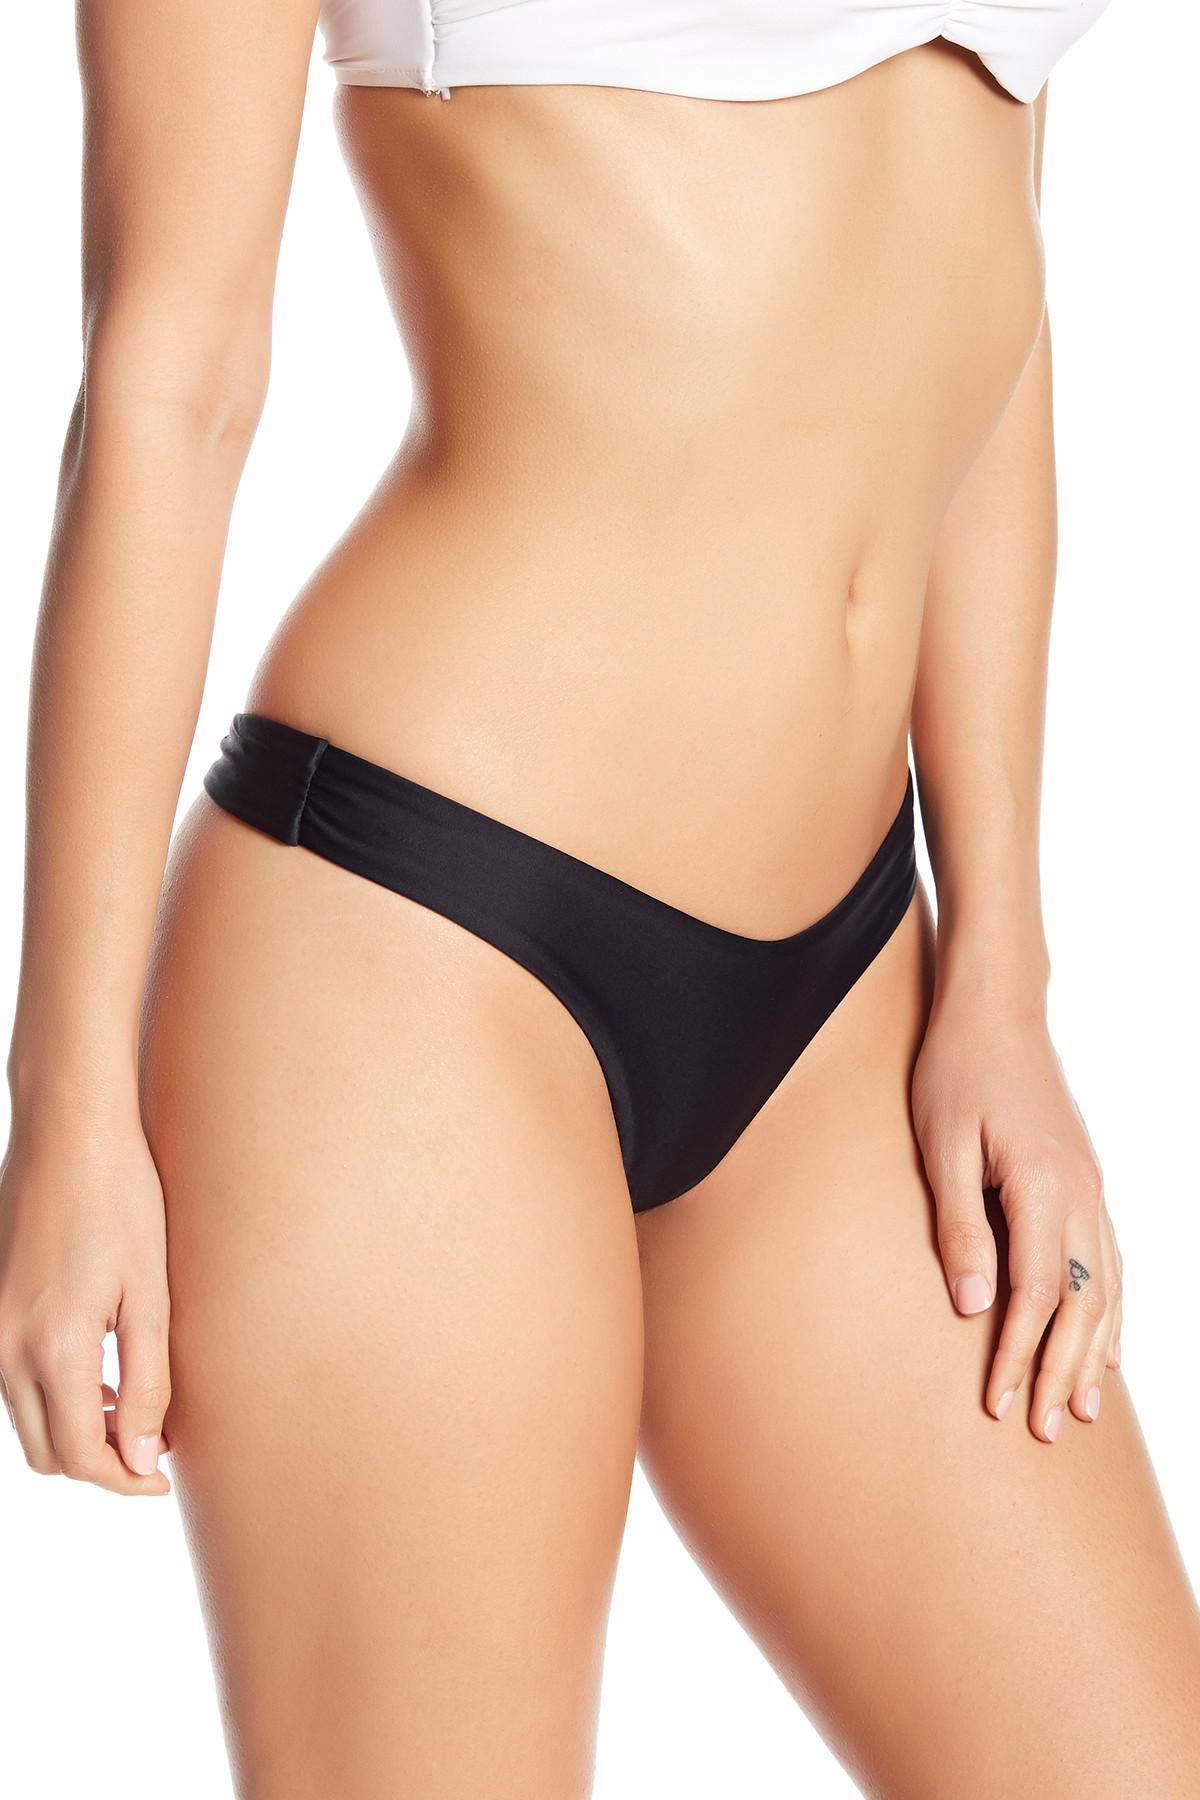 d4c3bfa9041 Mia Marcelle California Thong Bikini Bottom in Black - Lyst